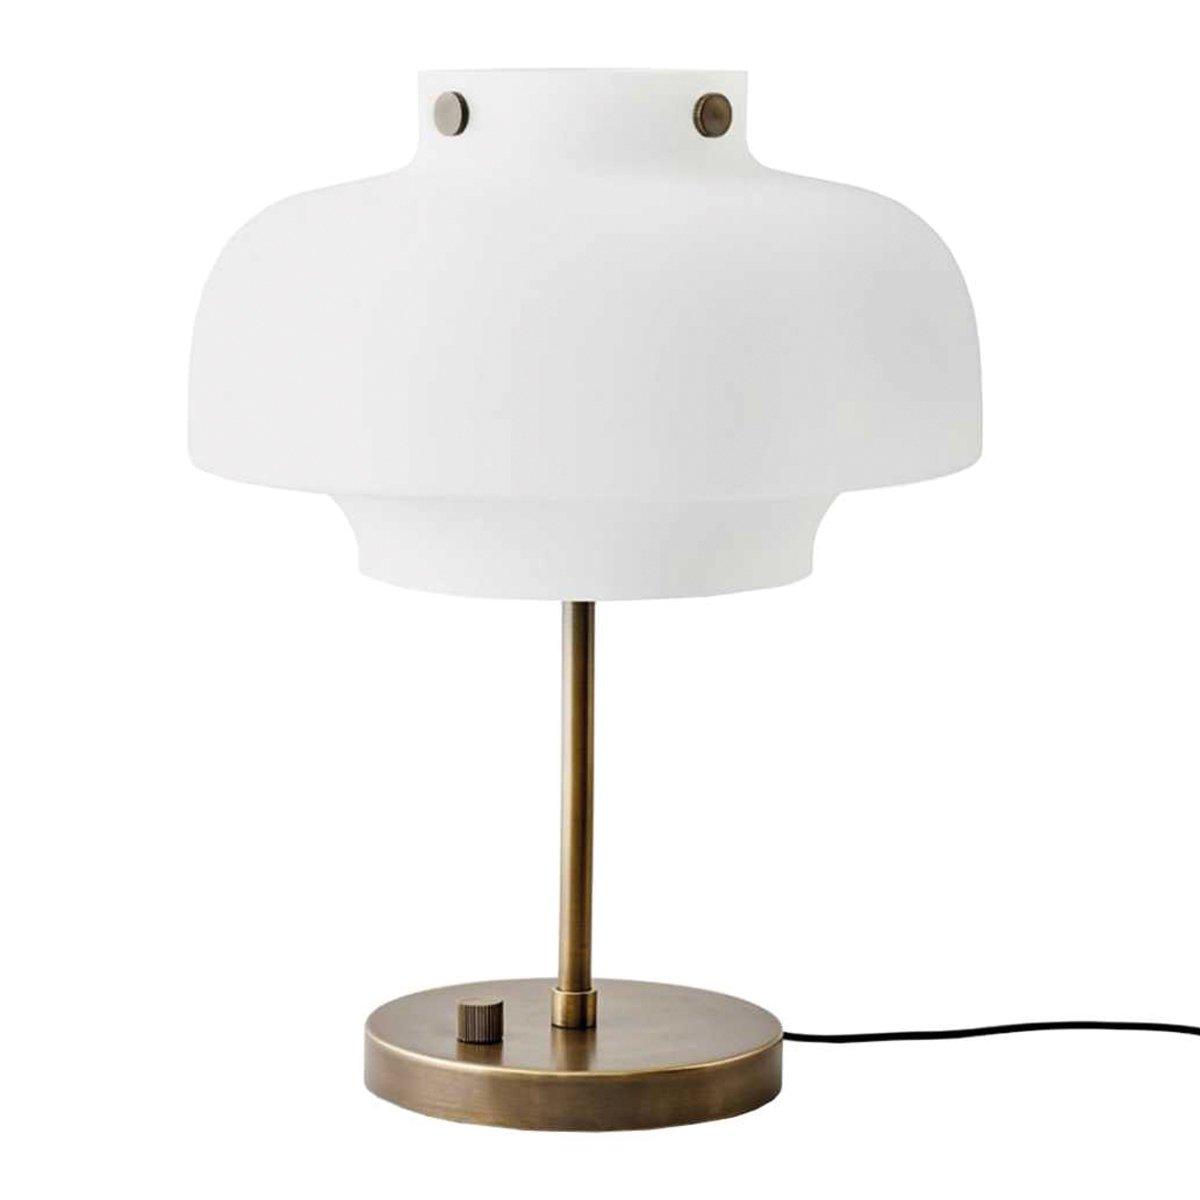 &Tradition Copenhagen Tafellamp SC13